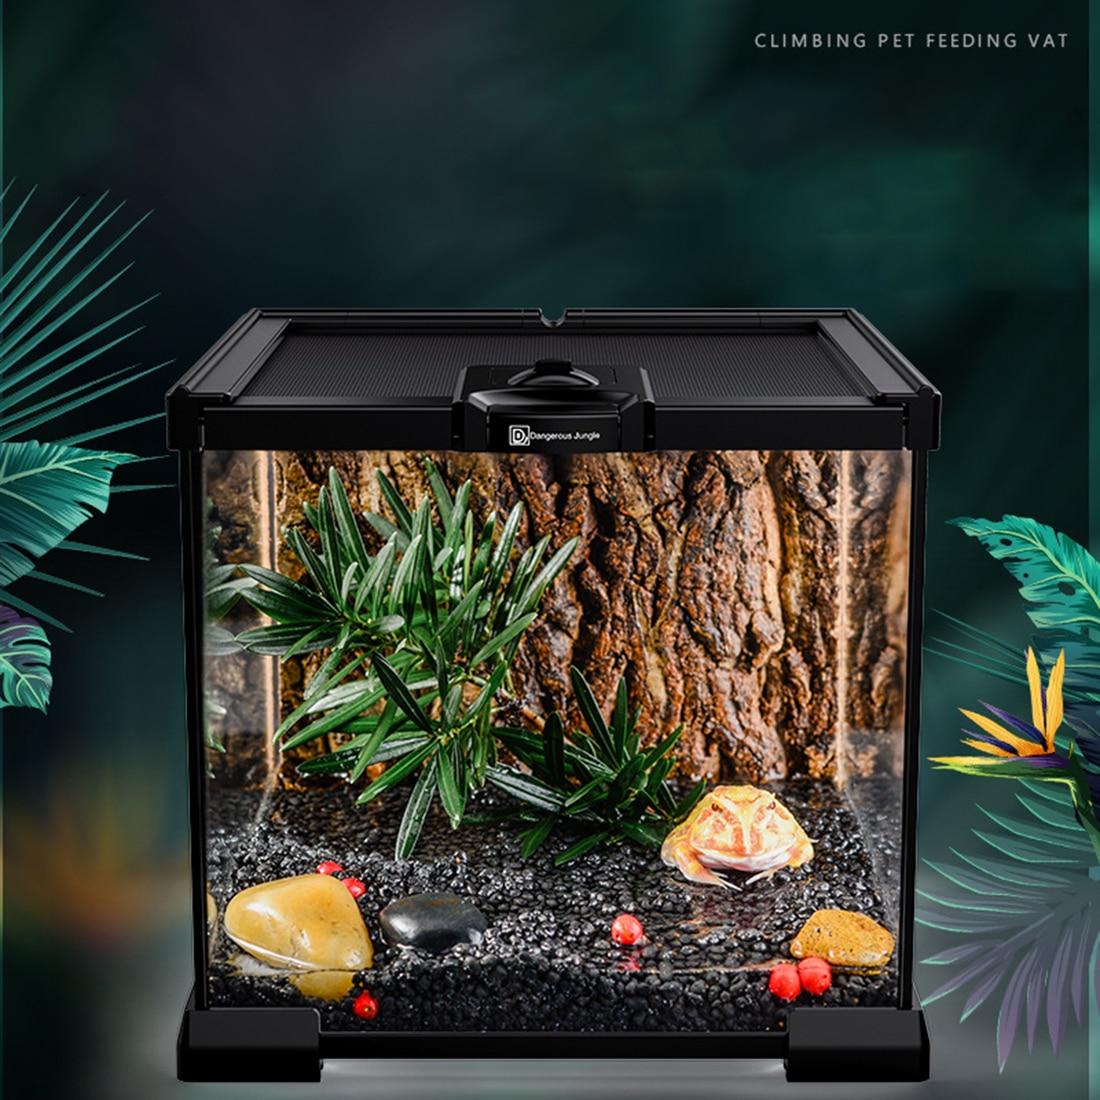 Hot 20 X 20 X 16 Reptile Terrarium Climbing Pet Feeding Box Stackable Beetle Spiders Breeding Container - Black + Transparent